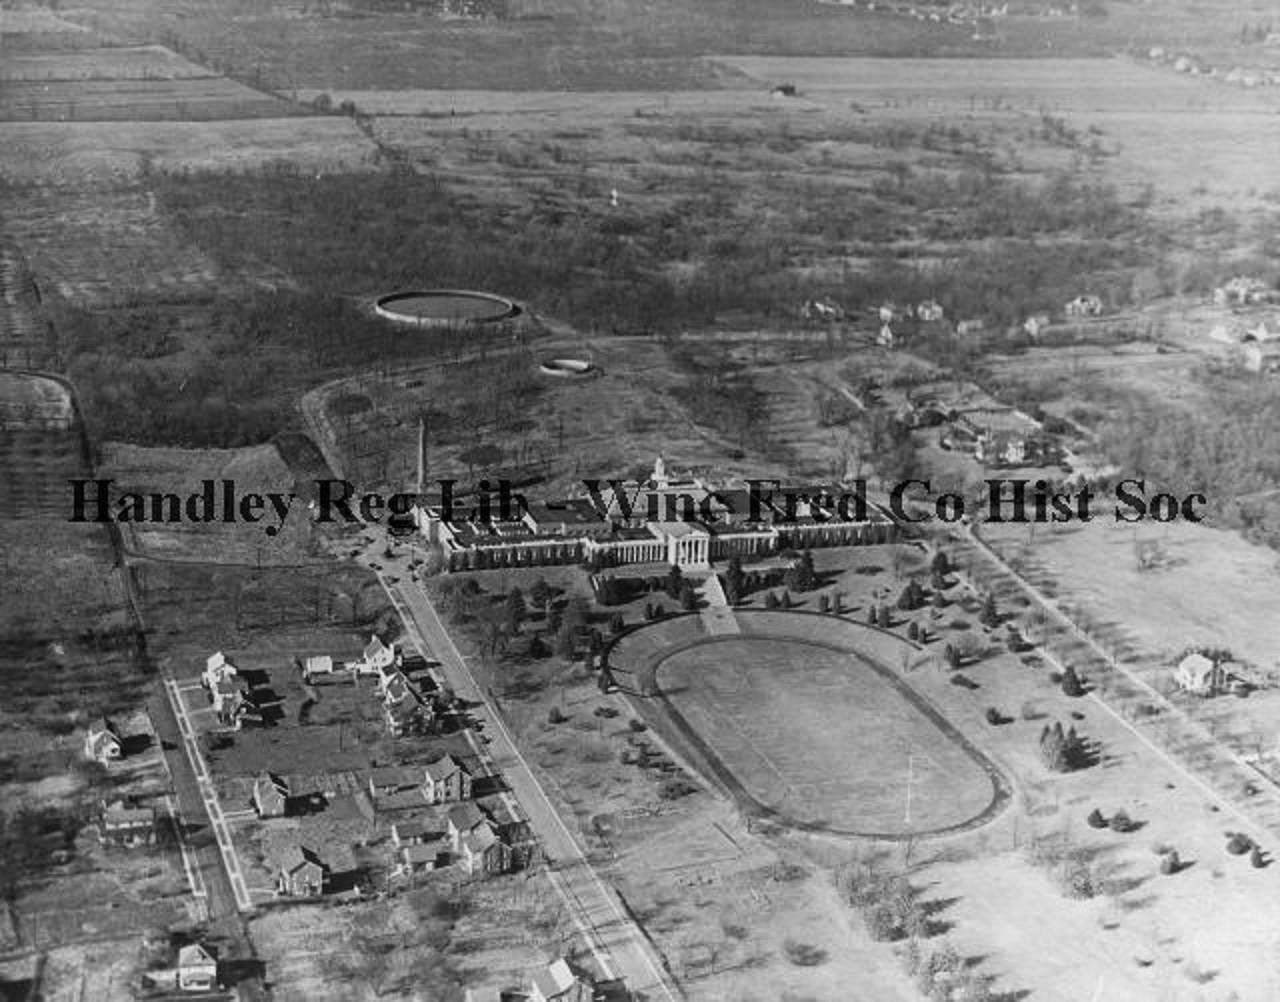 Aerial view of handley high school taken on january 17